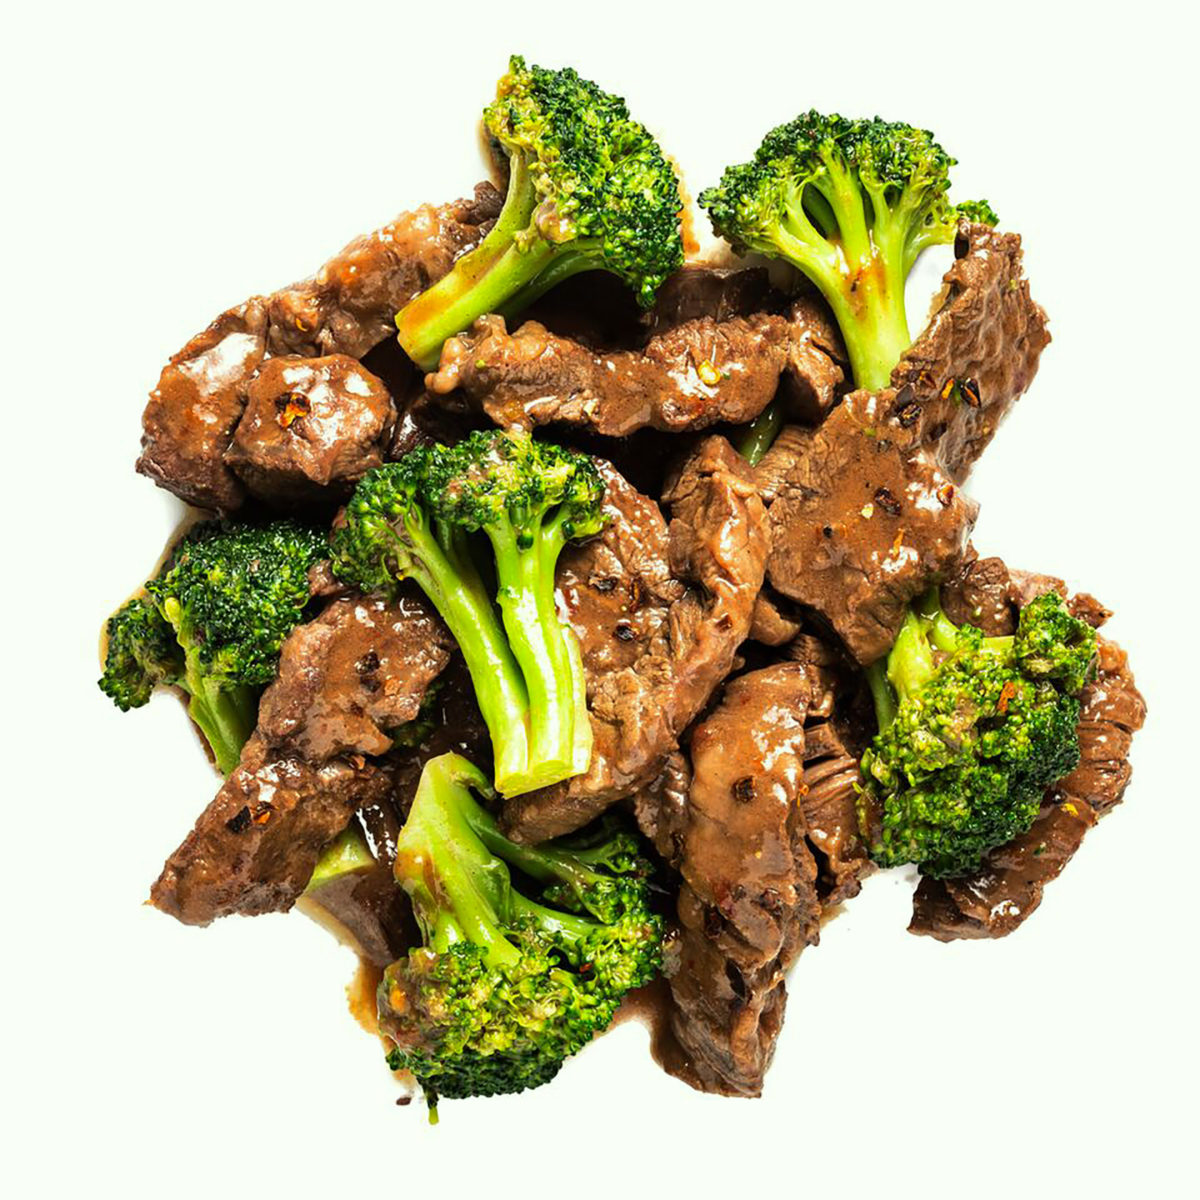 Gluten Free Beef and Broccoli Stir-Fry